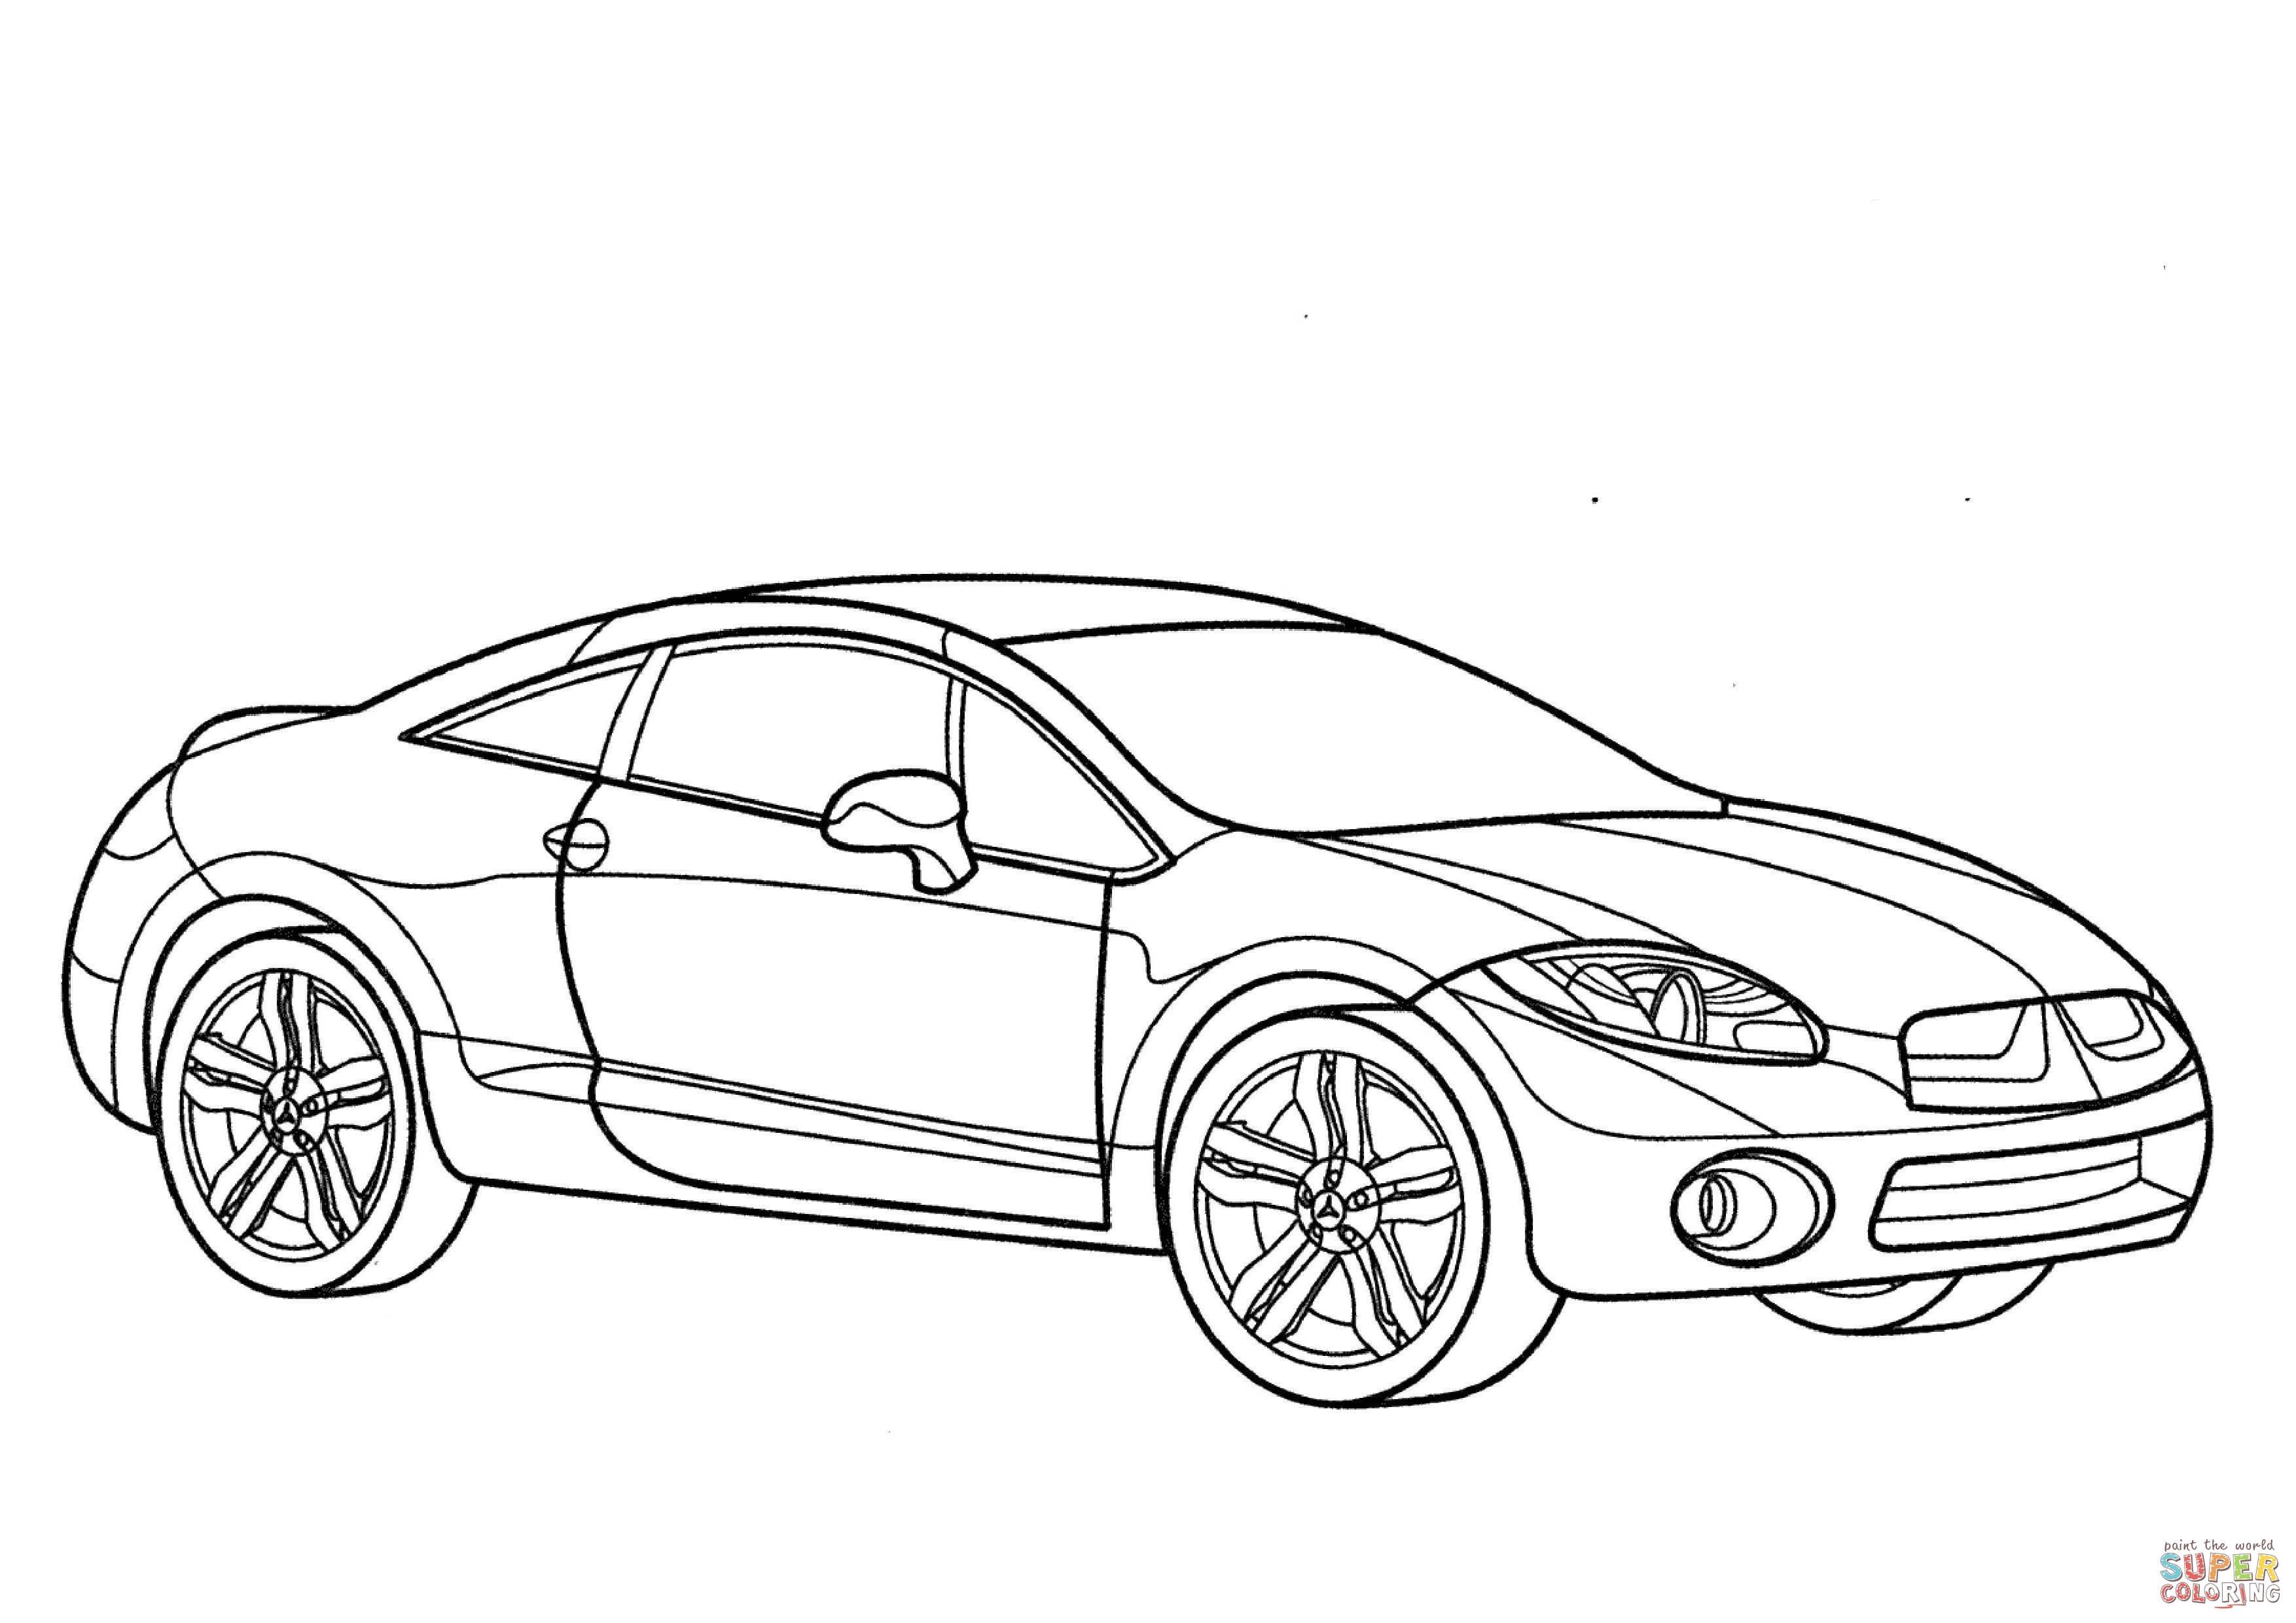 Kleurplaten Fast And Furious 7 Ausmalbild: Mitsubishi